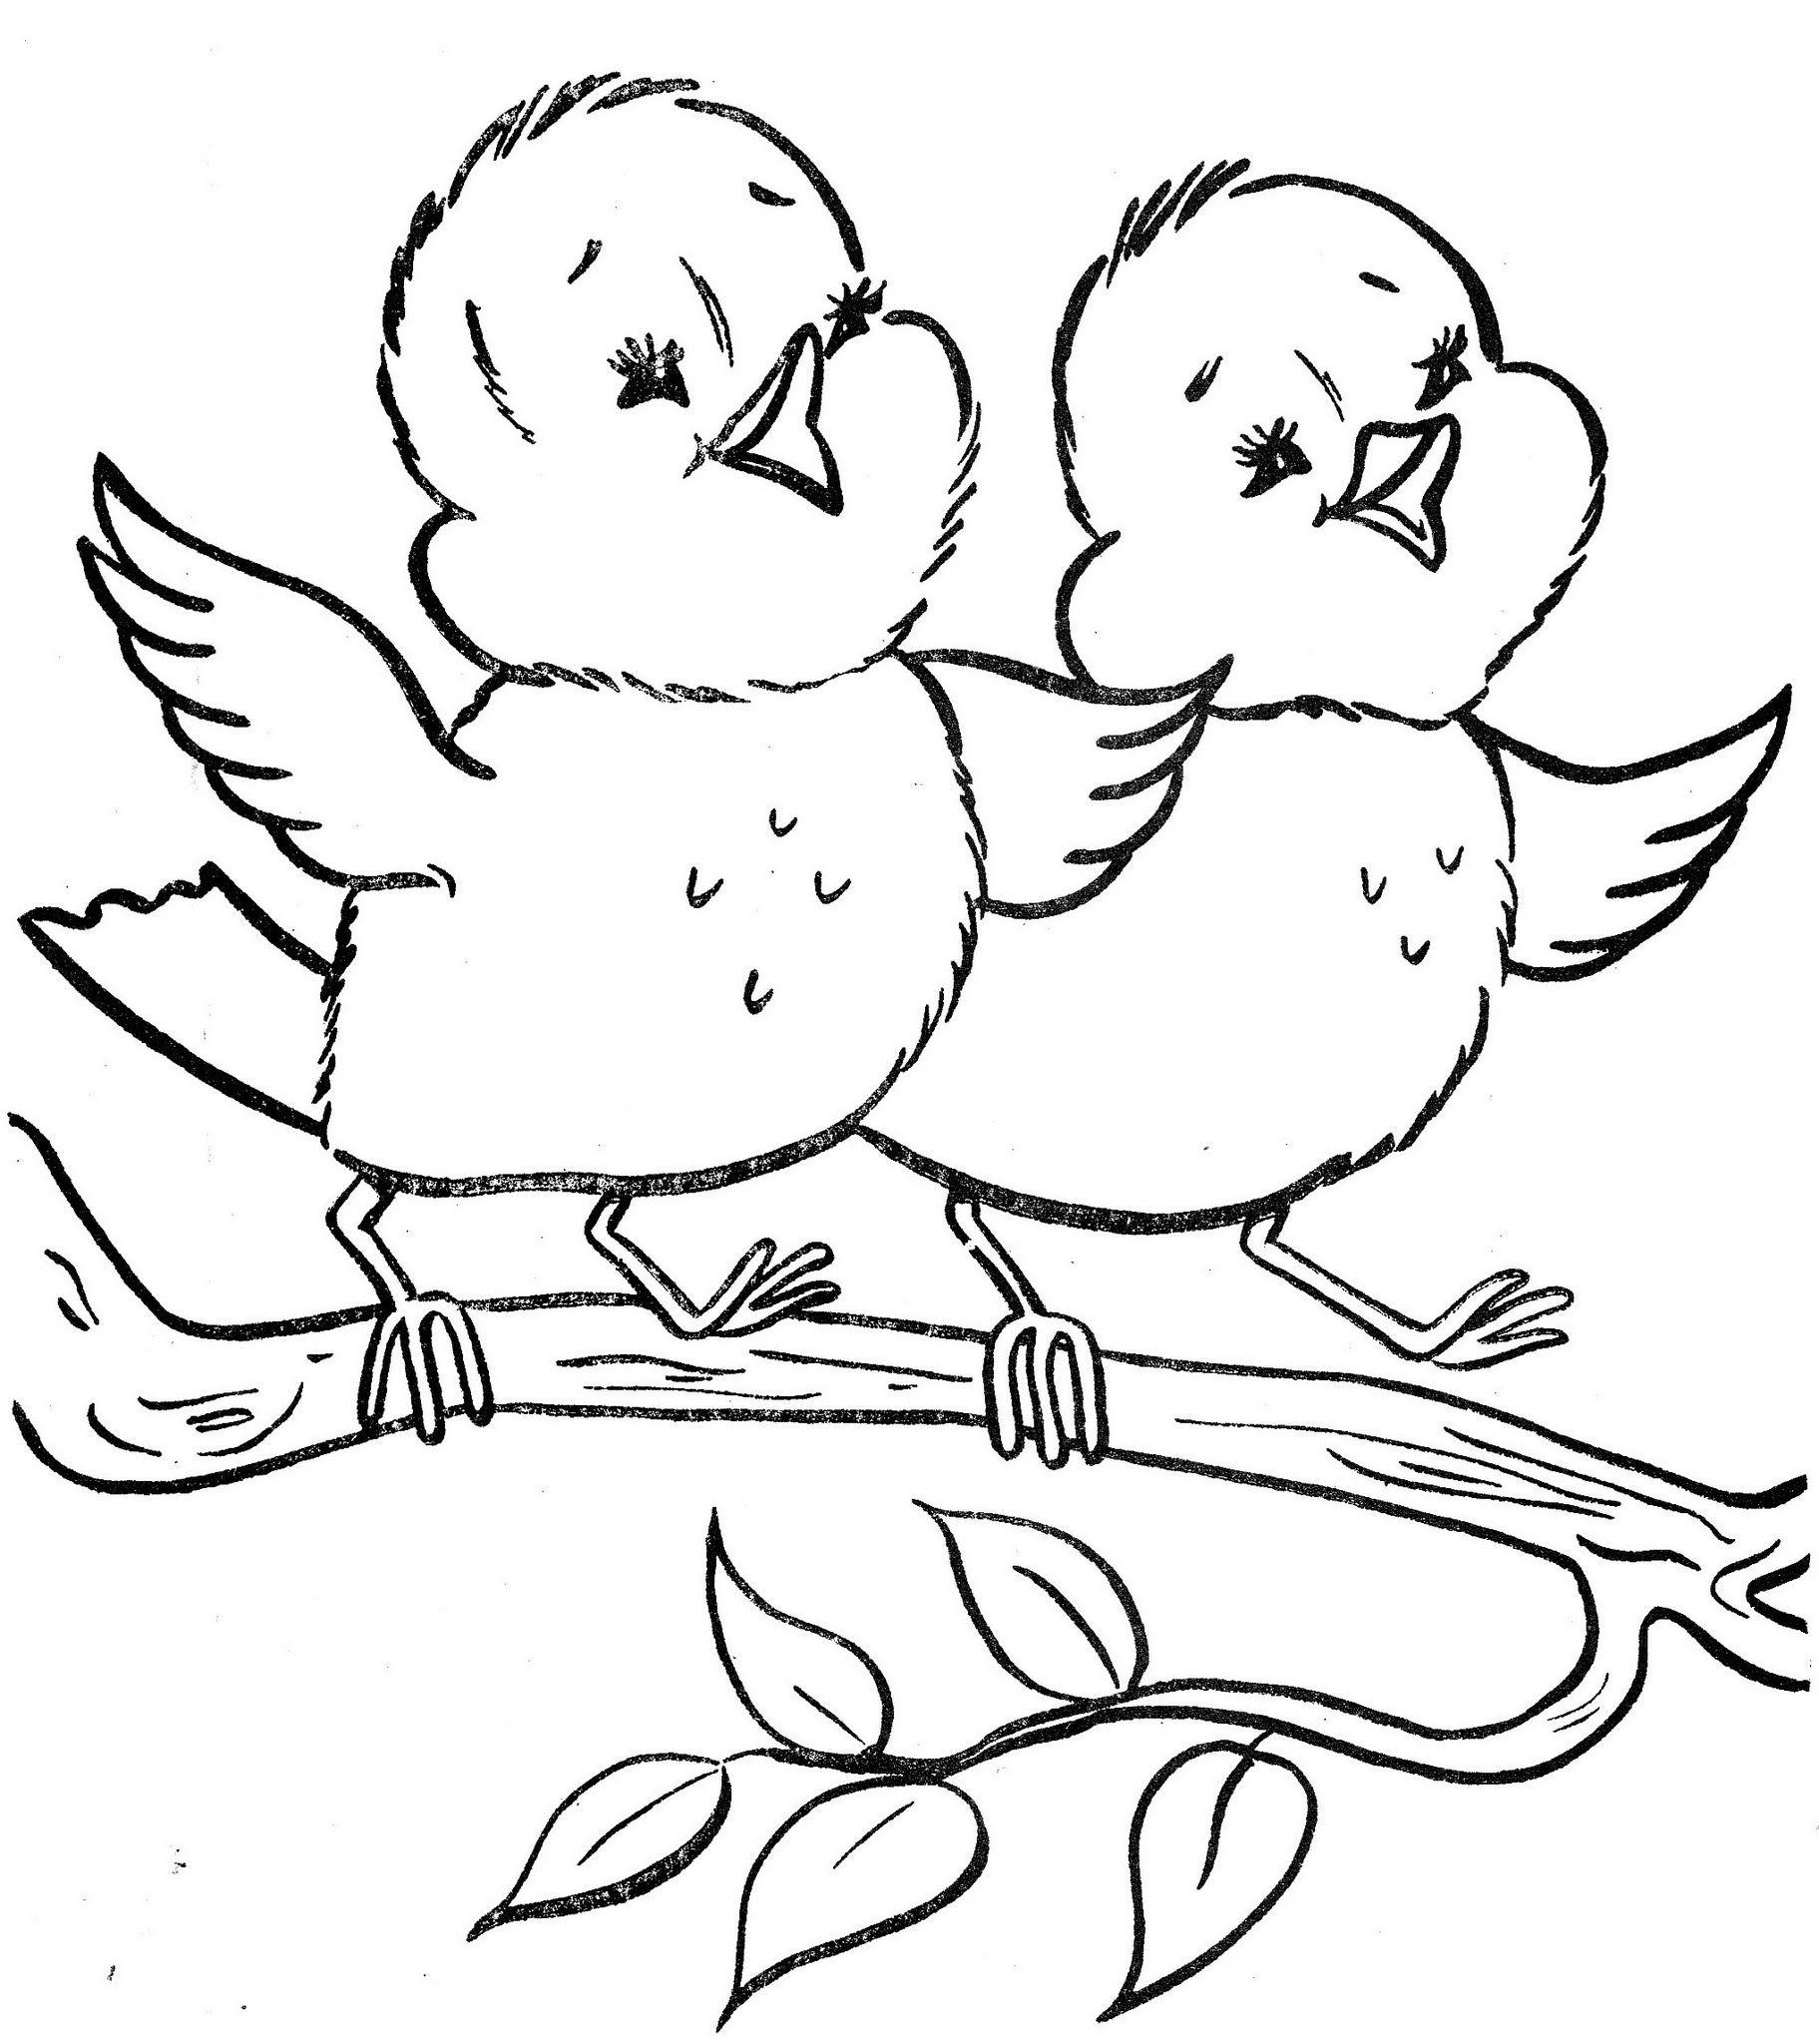 spring birds coloring pages رسومات للتلوين موقع المعلمة ألحان أبو الهيجا pages spring coloring birds